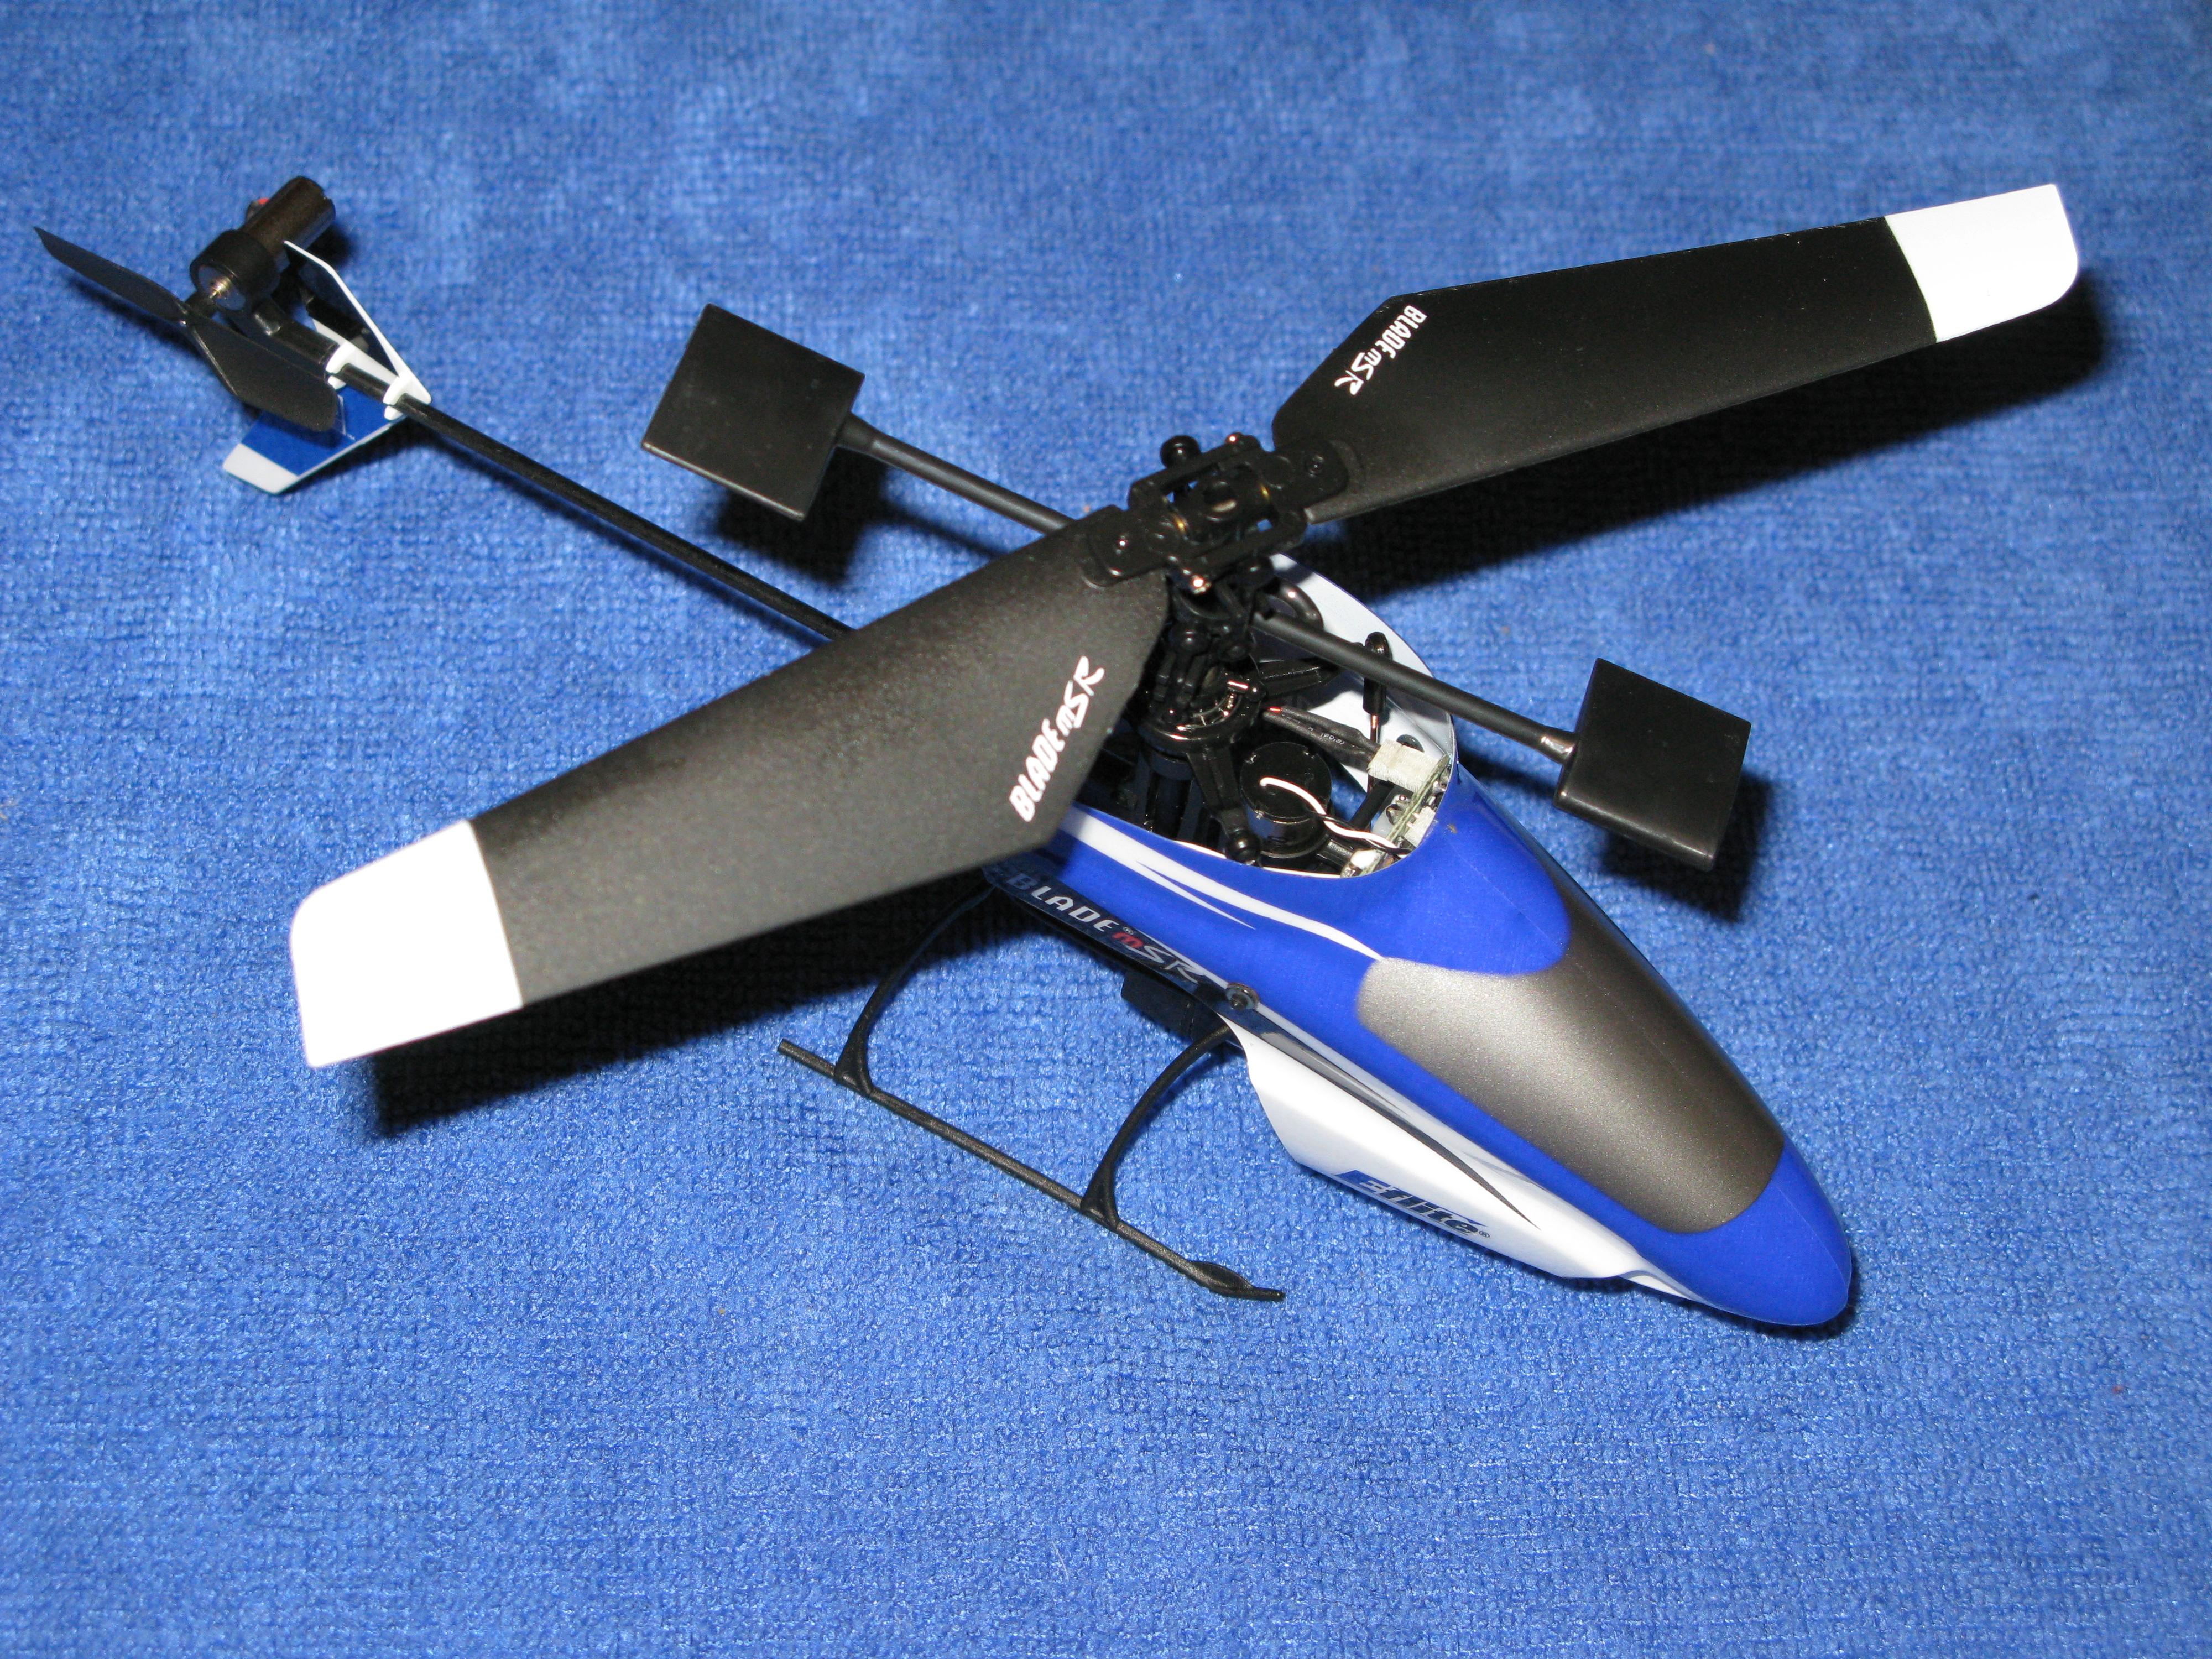 Single rotor drone